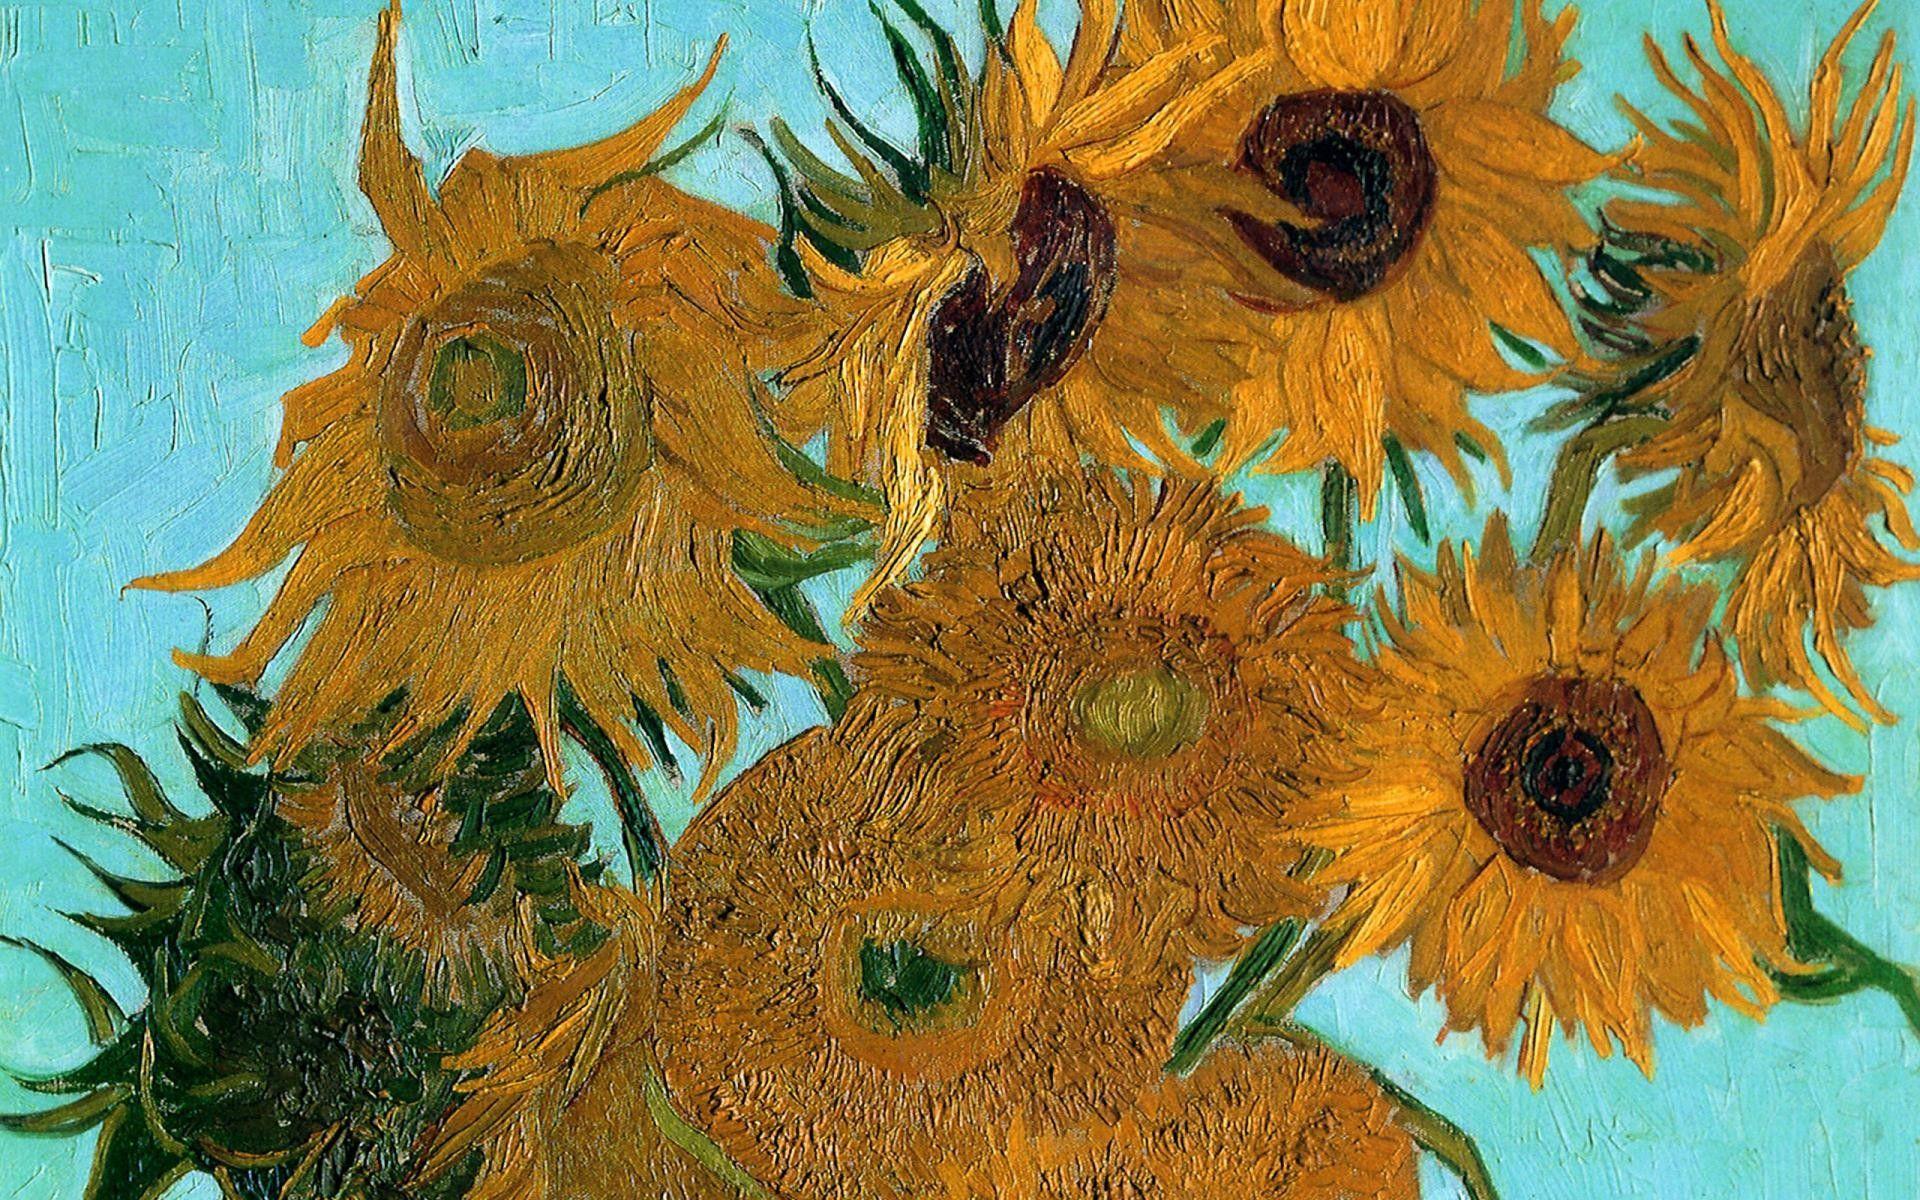 1920x1200 Van Gogh Full Hd Wallpaper For Desktop Background Download Images High Resolution Images Desktop Wallpaper Art Van Gogh Wallpaper Painting